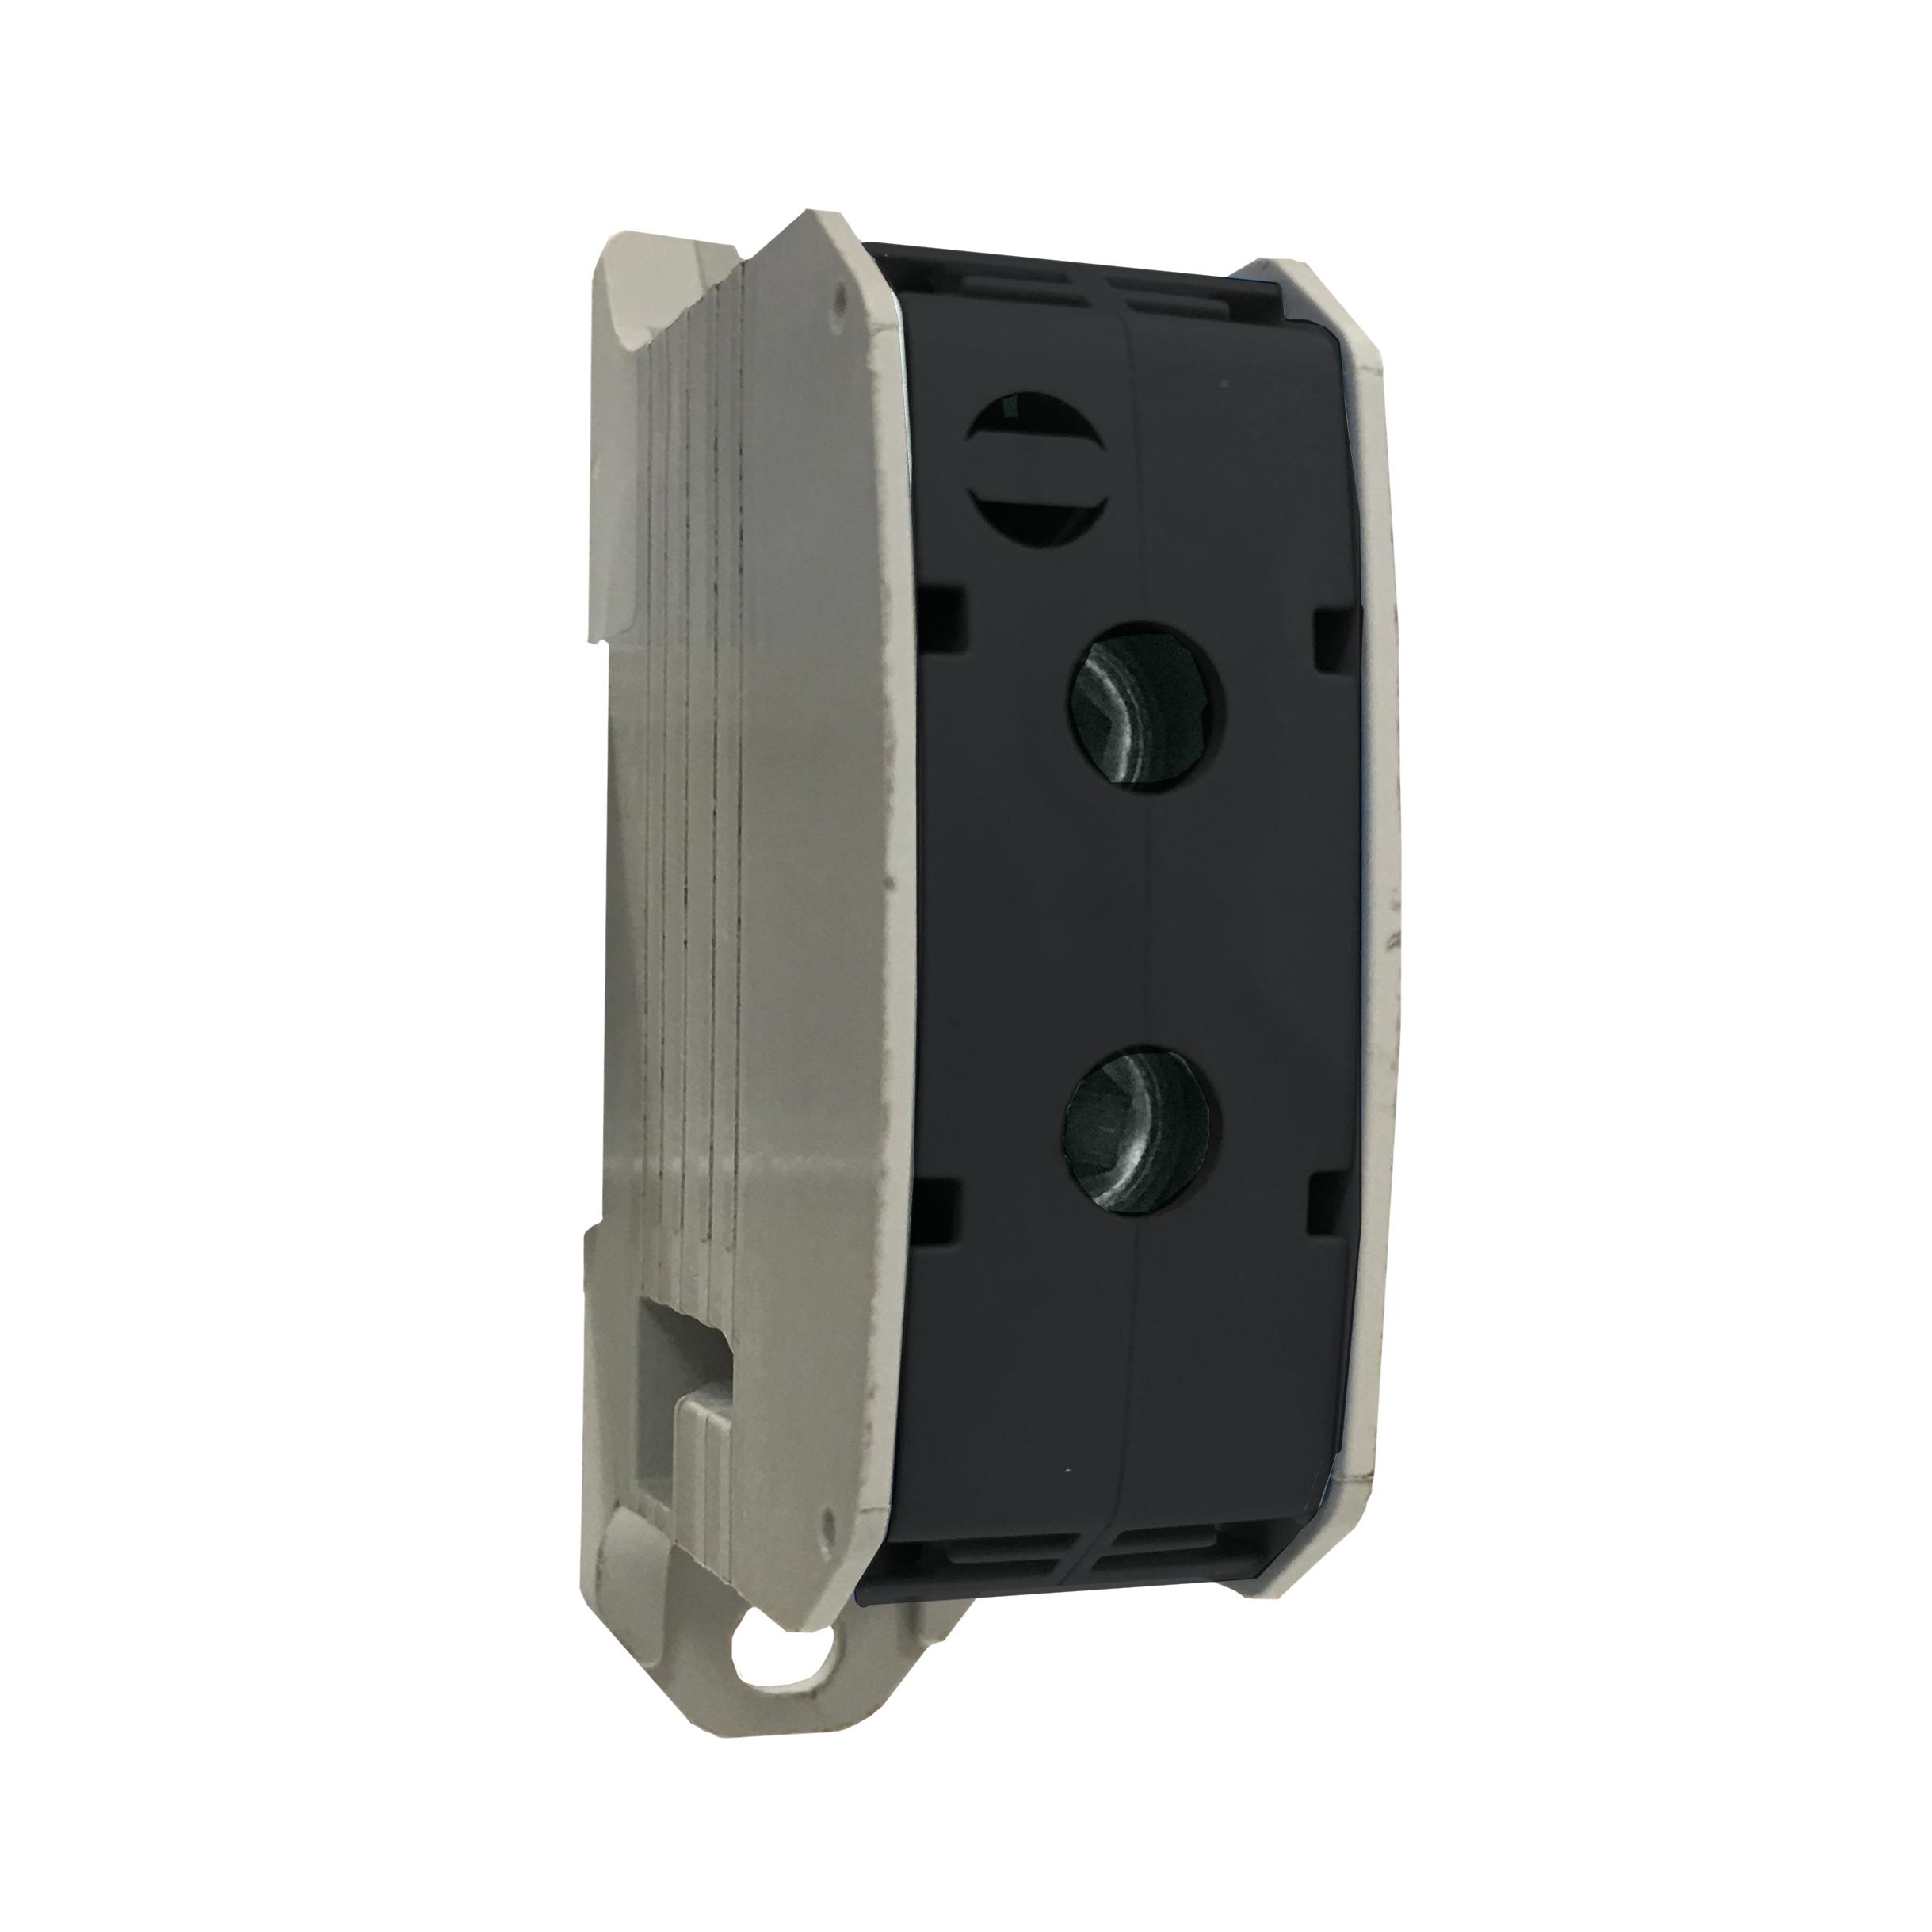 1 Stk Aluminium /Kupfer Klemme, 1-polig, 185mm² schwarz IKA21550--